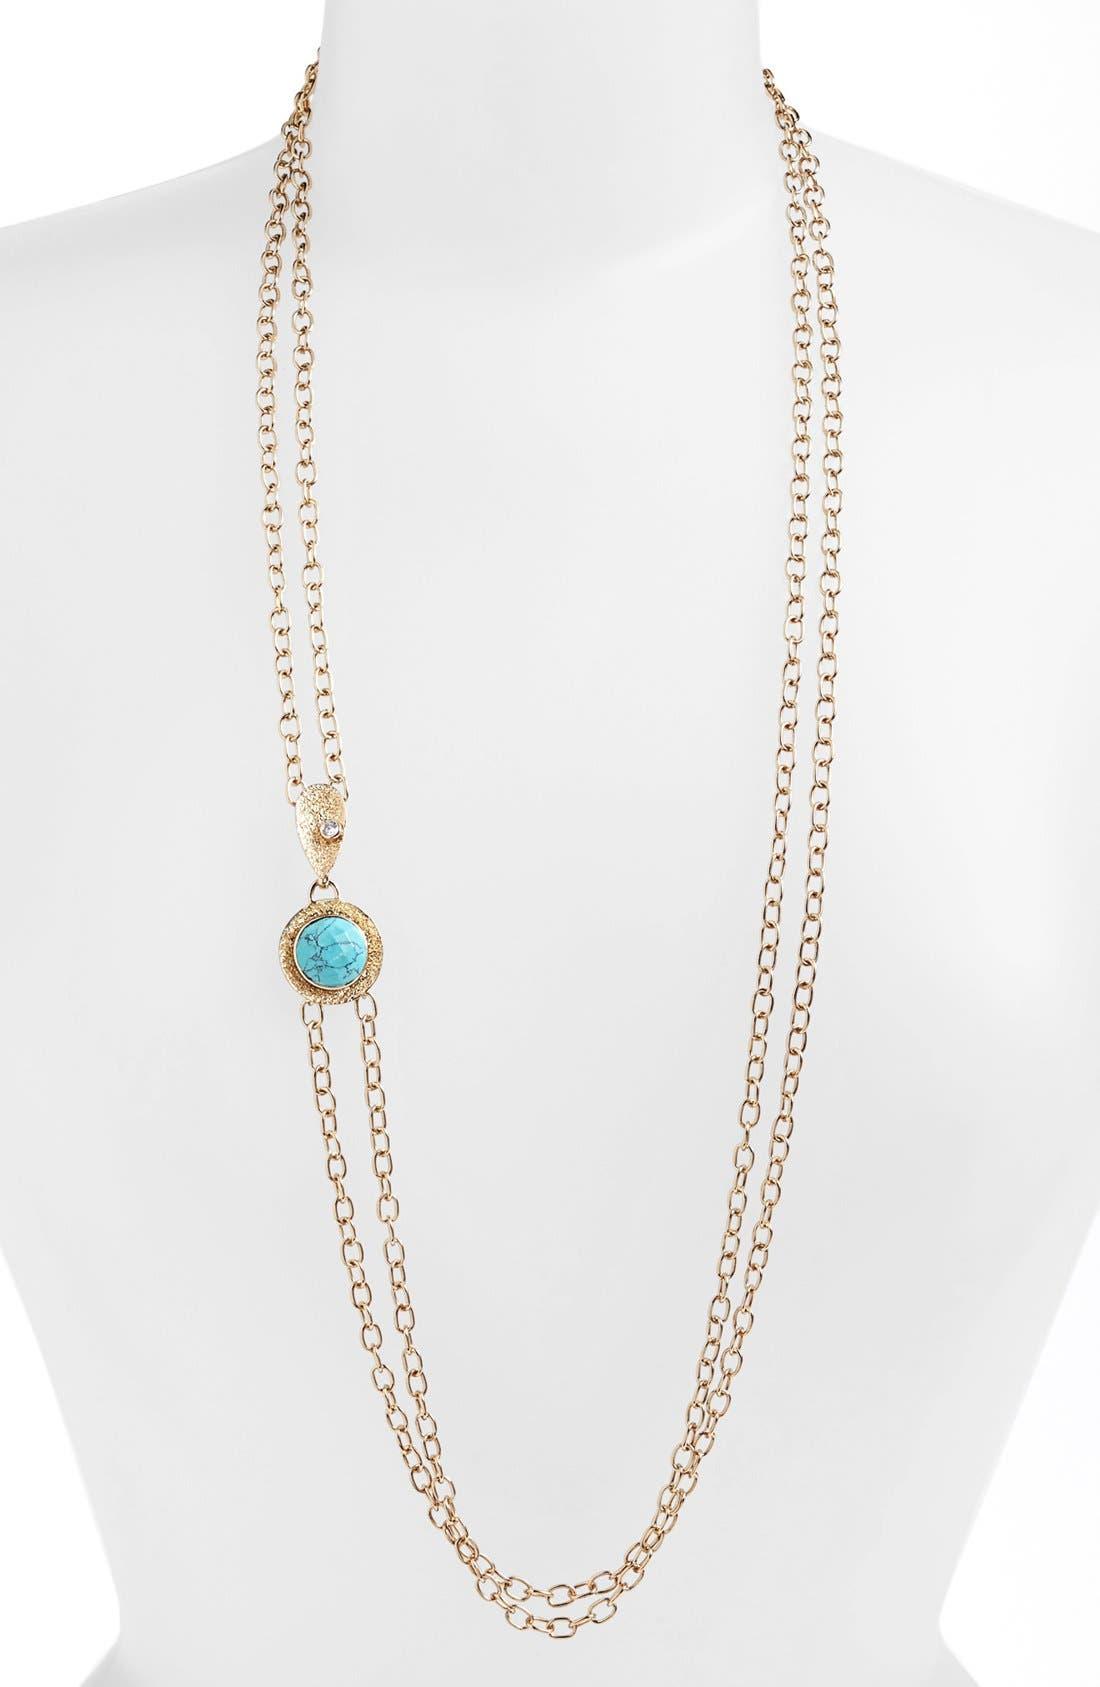 Main Image - Melinda Maria 'Sandra' Long Multistrand Necklace (Nordstrom Exclusive)